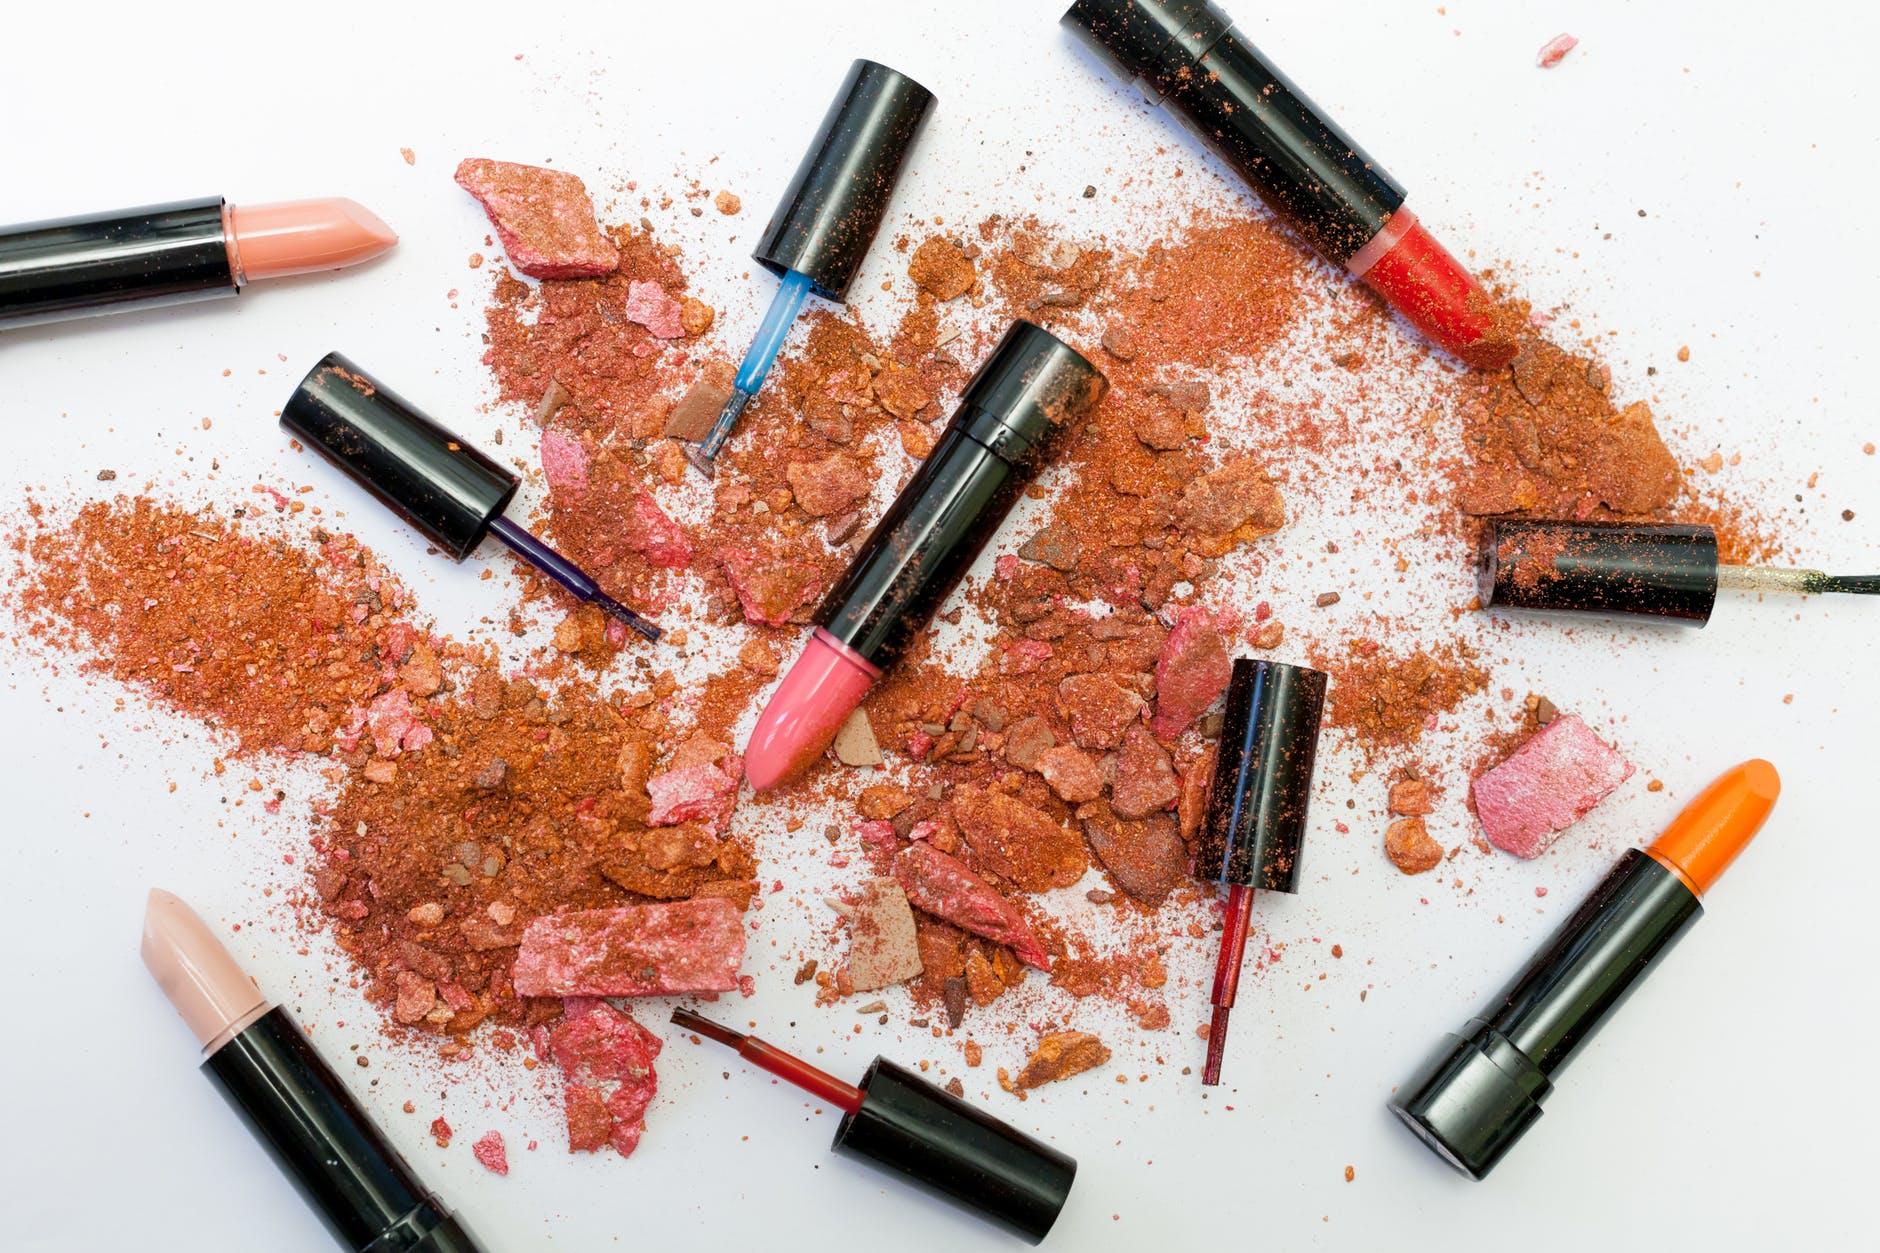 Cruelty Free Cosmetic Brands